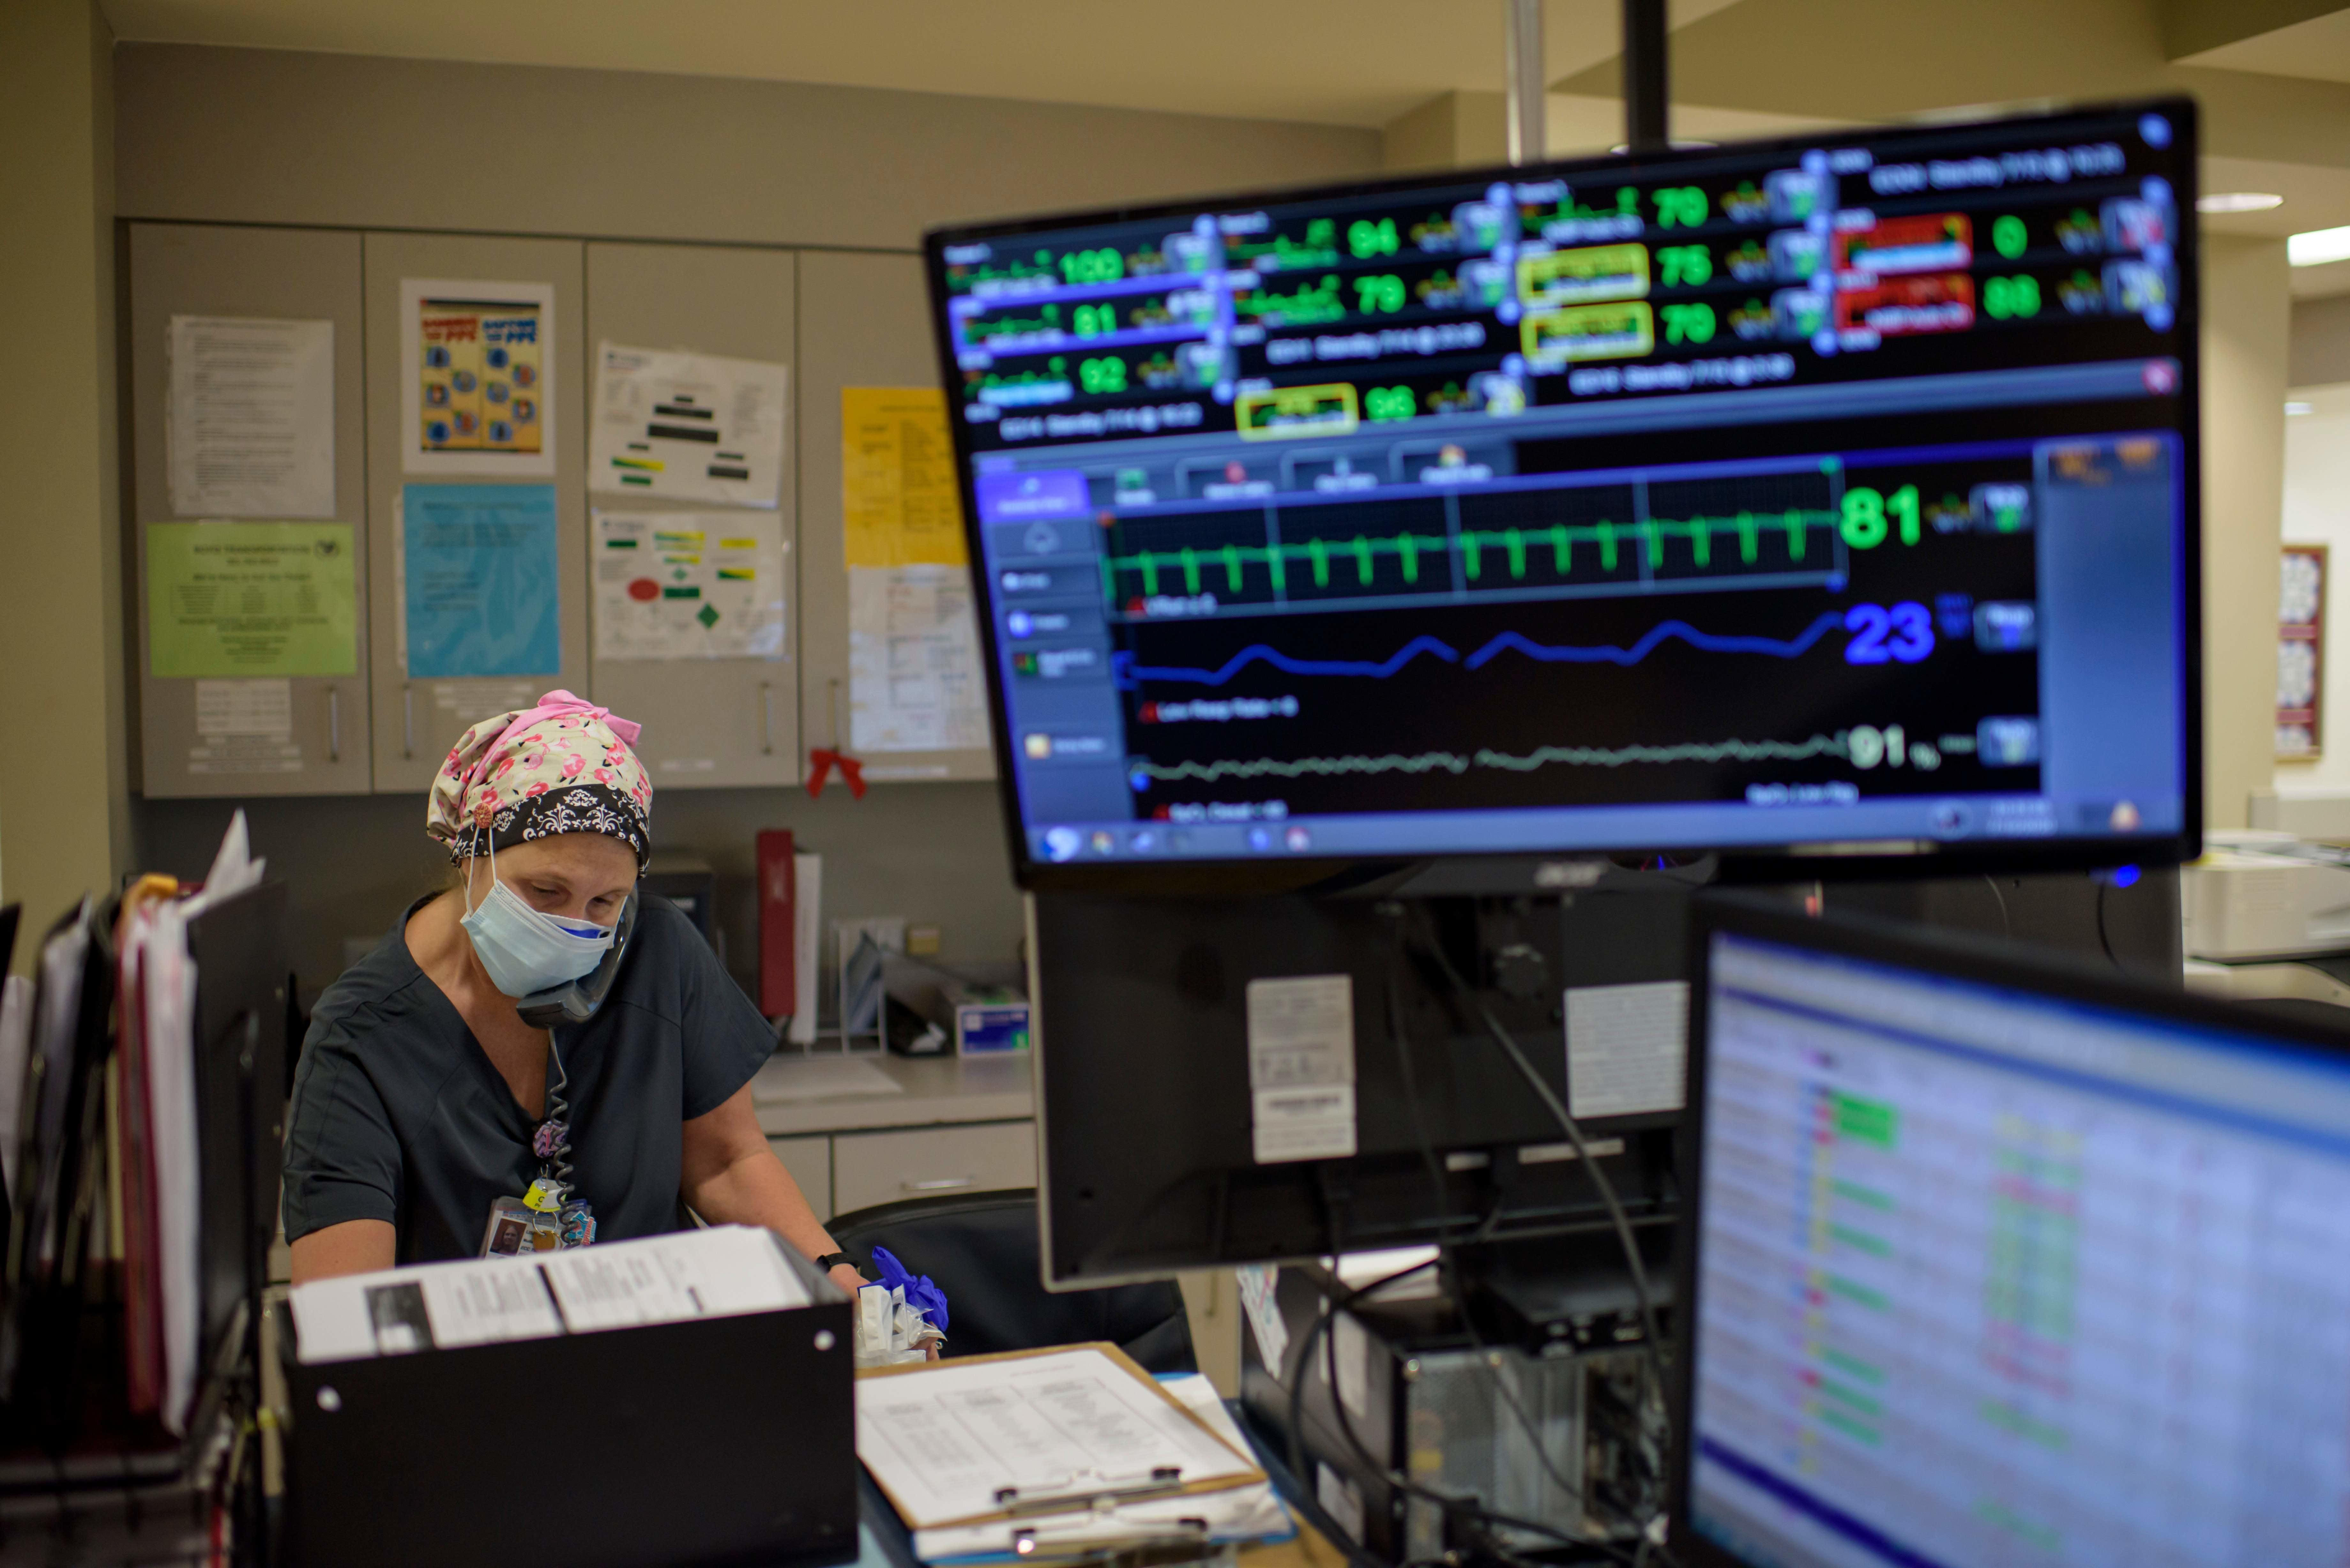 85 infants in one Texas county test positive for coronavirus